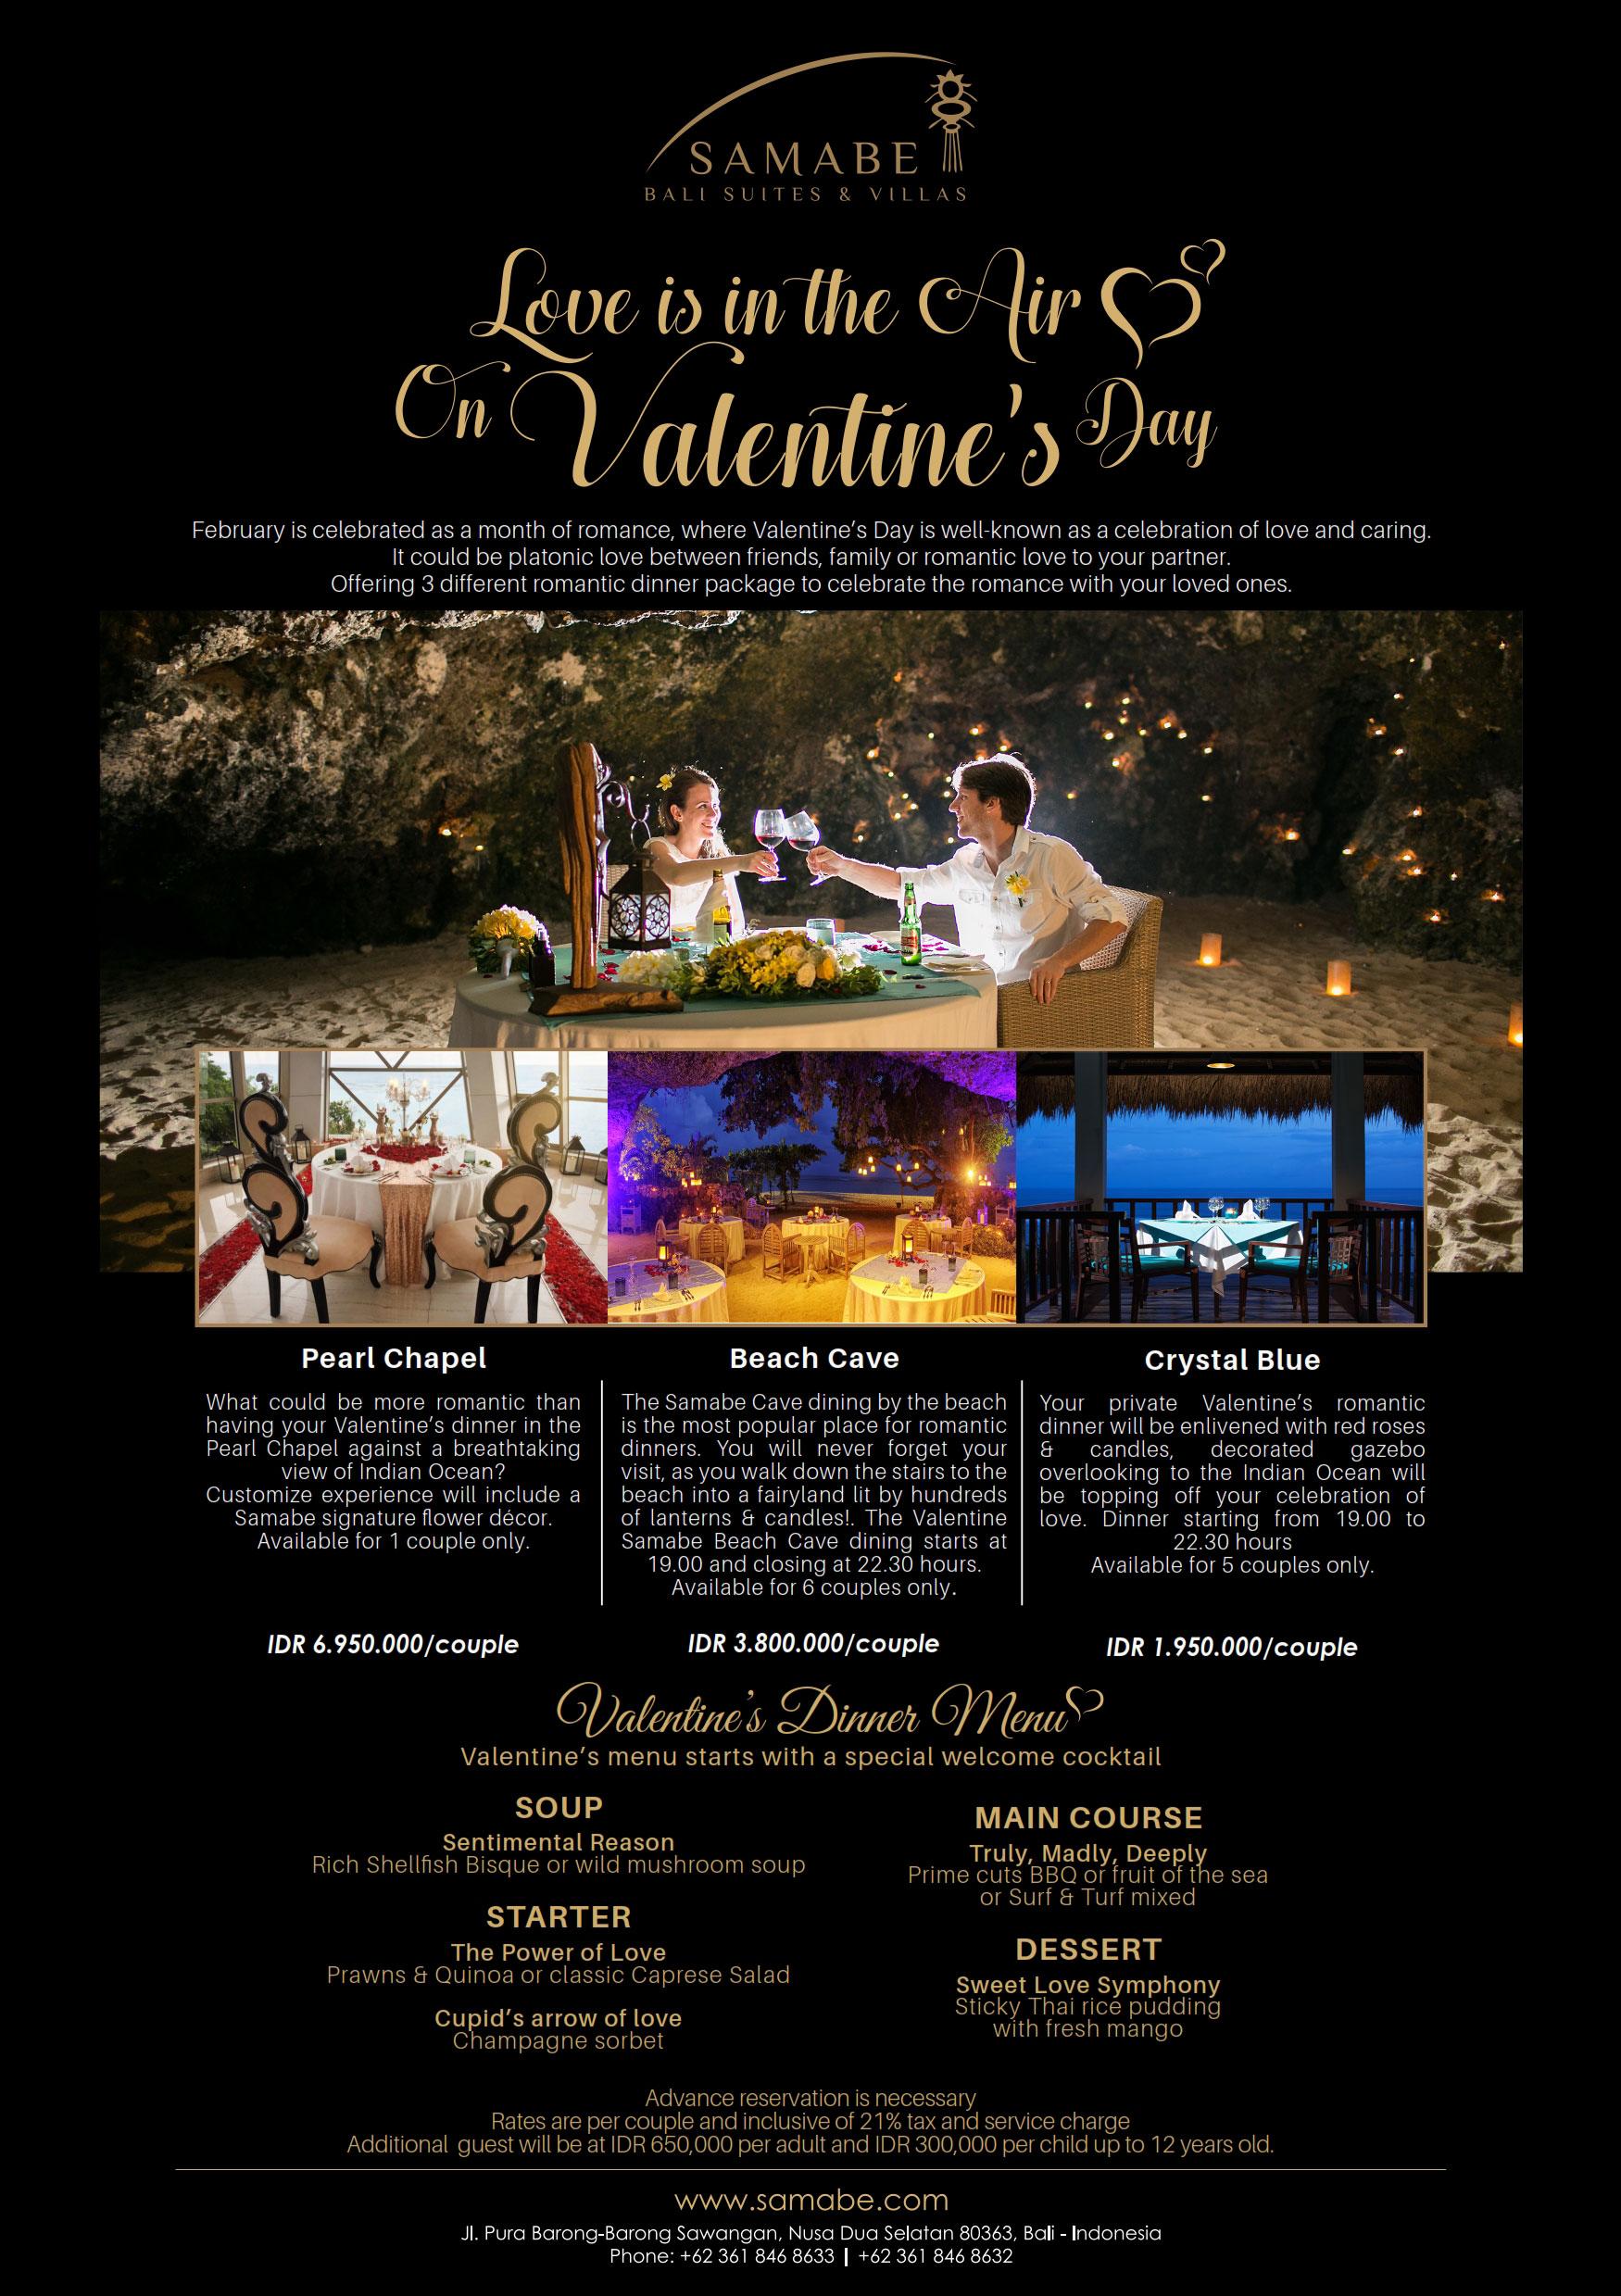 Samabe Valentine's Day Promotion